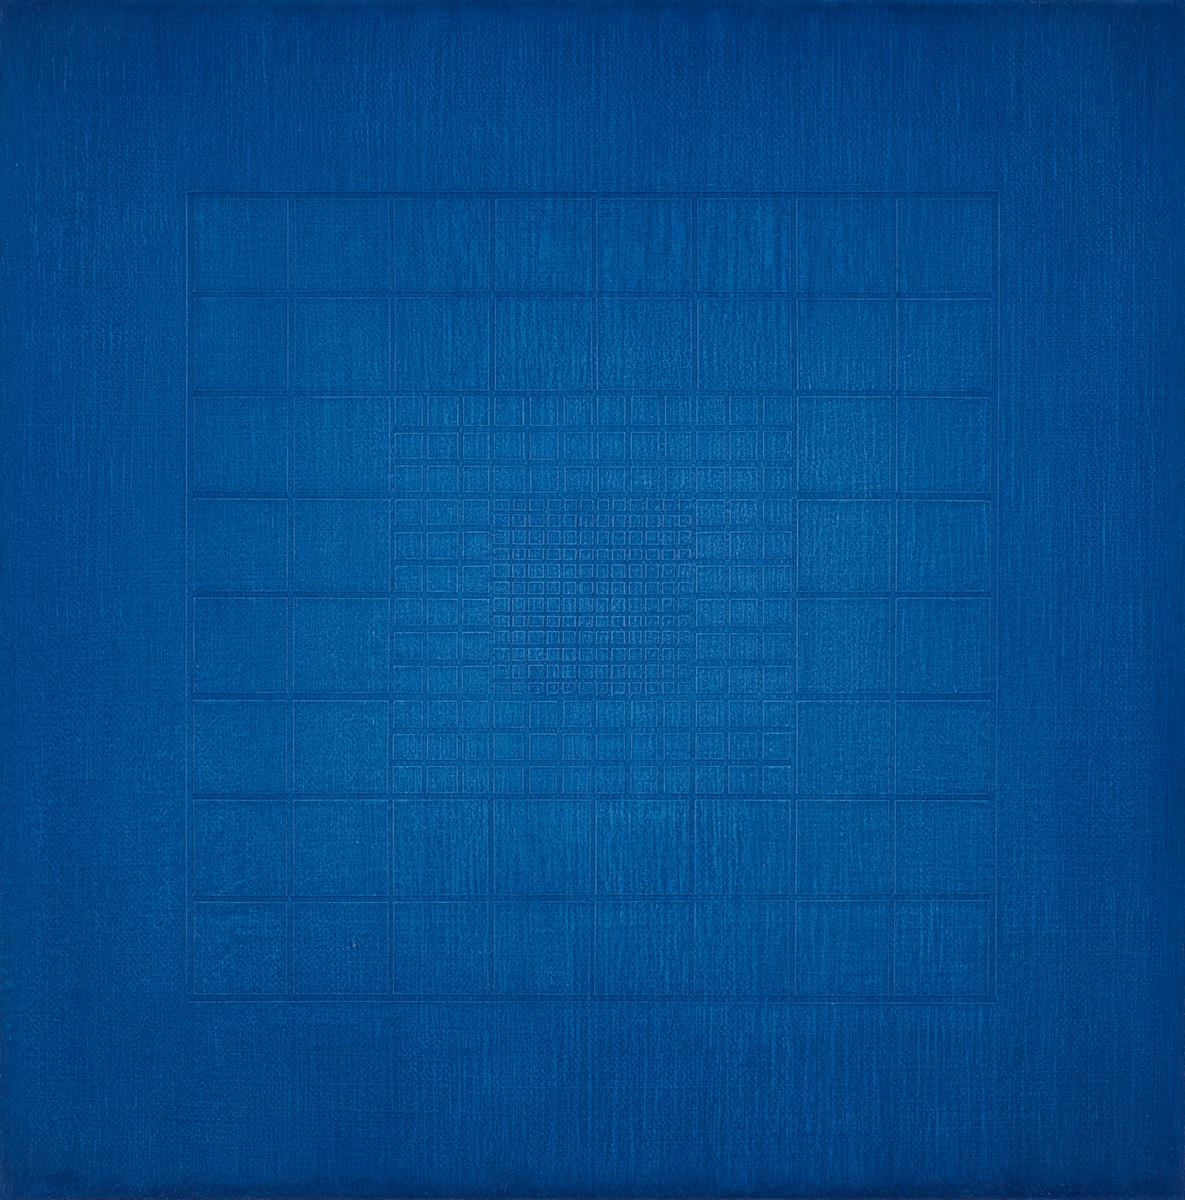 Silent-origo-metrum [20181021], 2018, acrylic on canvas, 11 13/16 x 11 13/16in. [30x30cm]